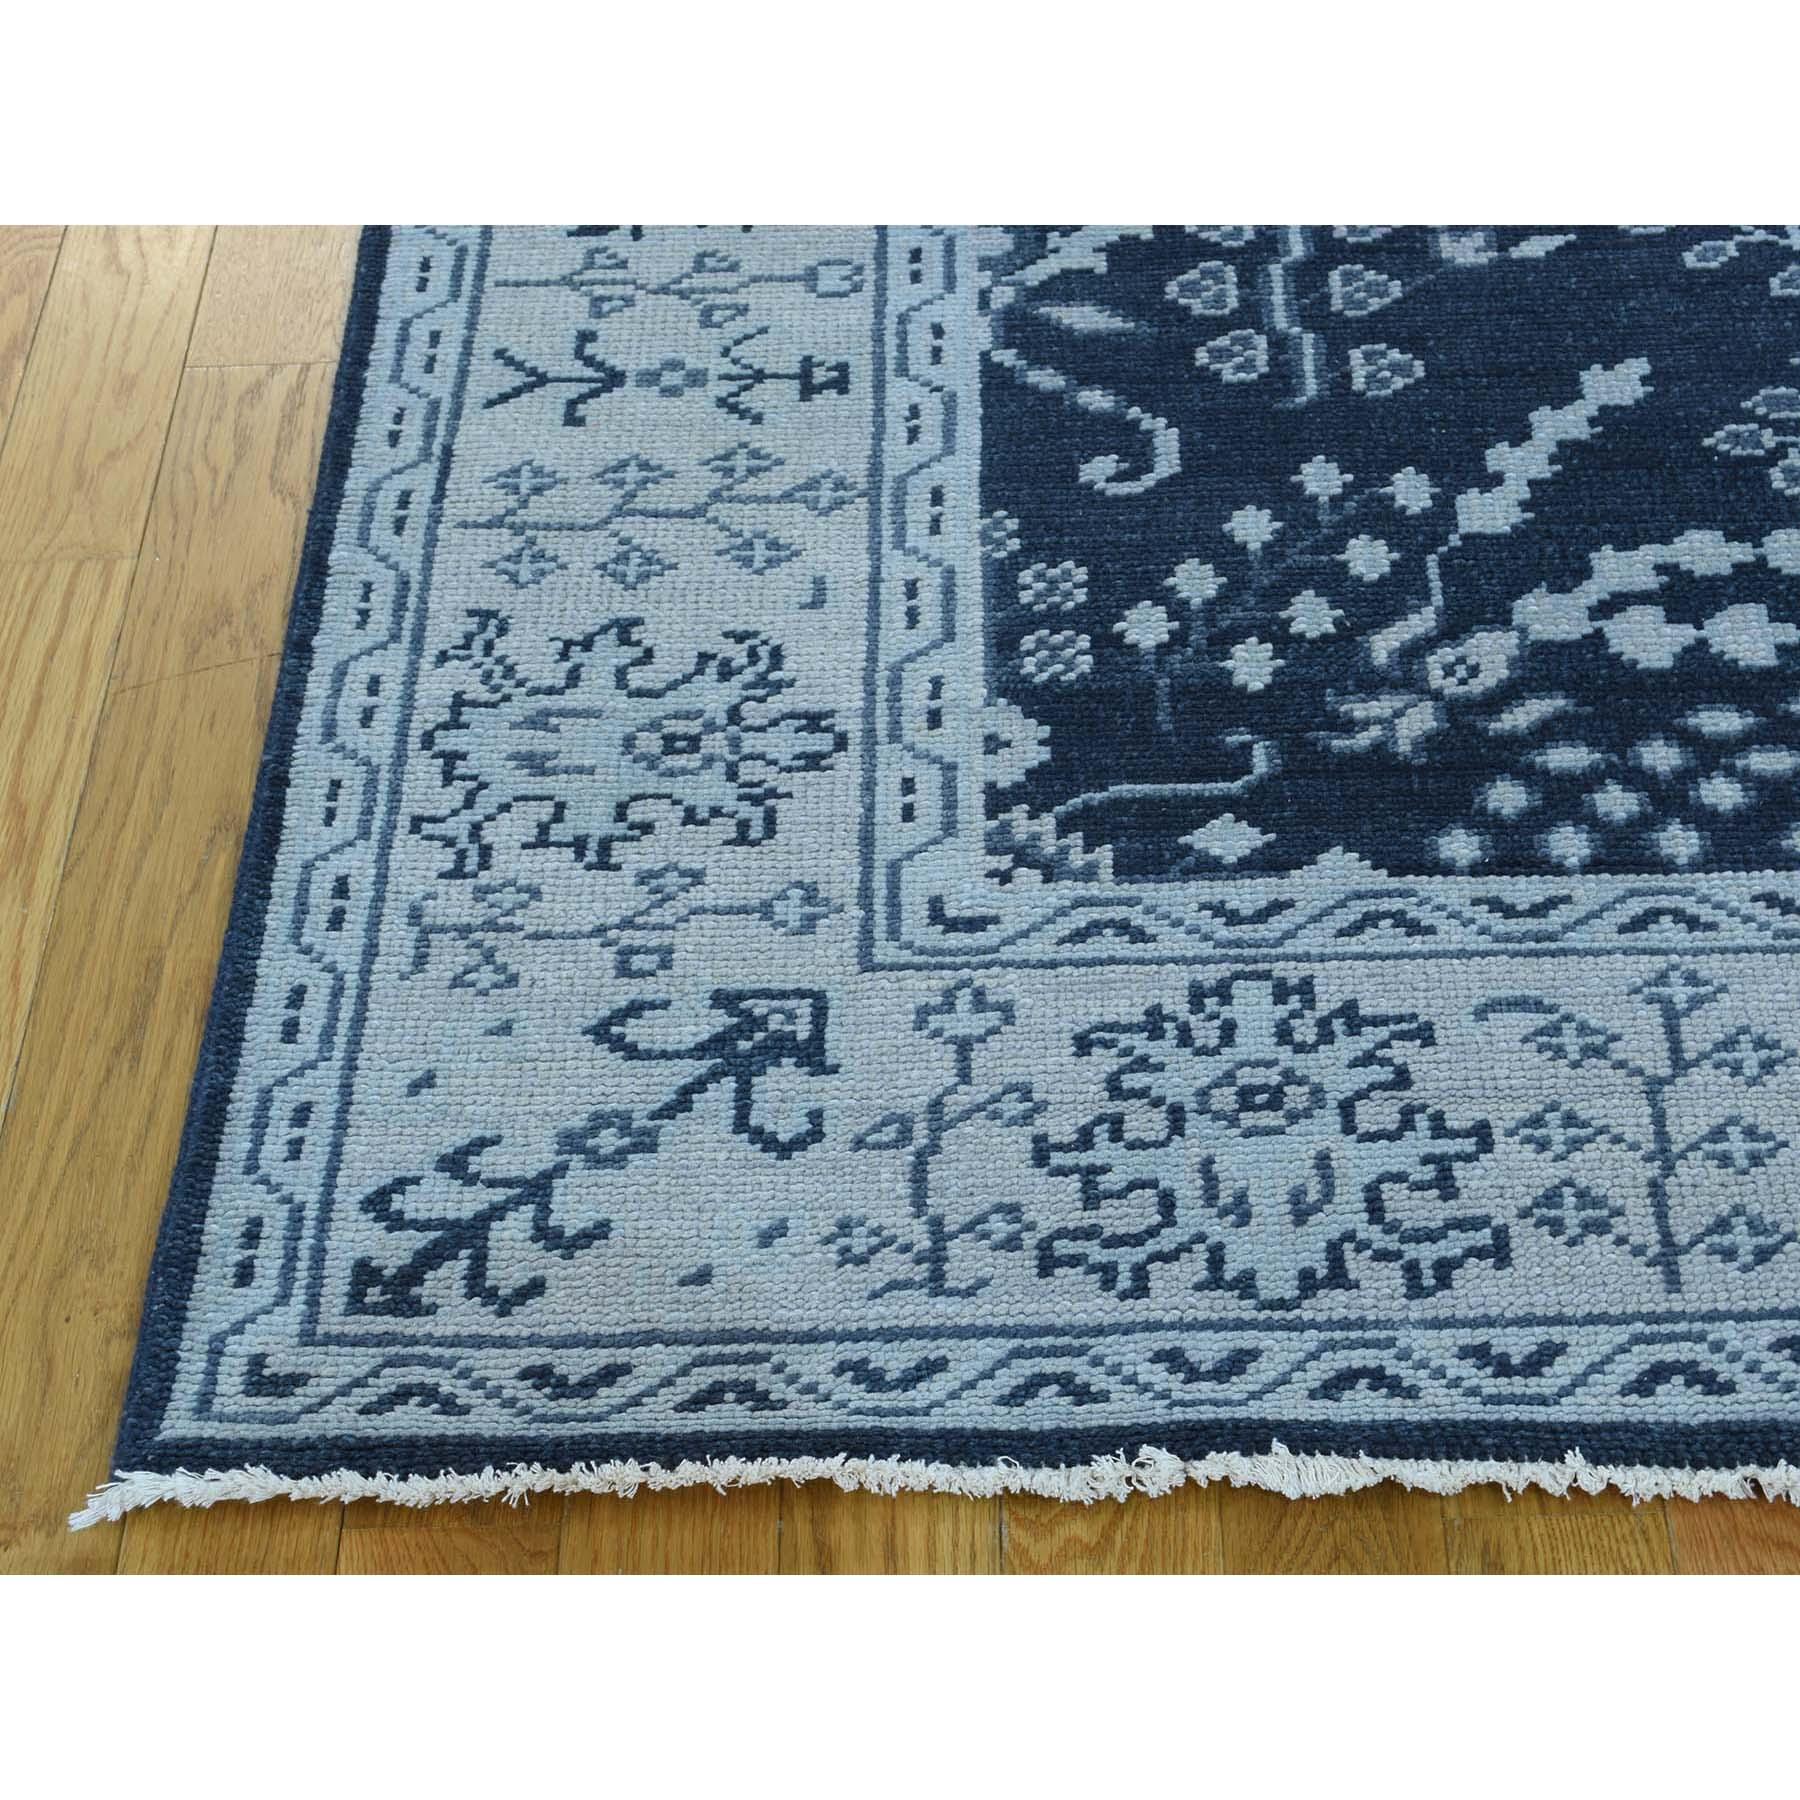 6'1''x9' Turkish Knot Oushak Sarouk Design Hand-Knotted Oriental Rug